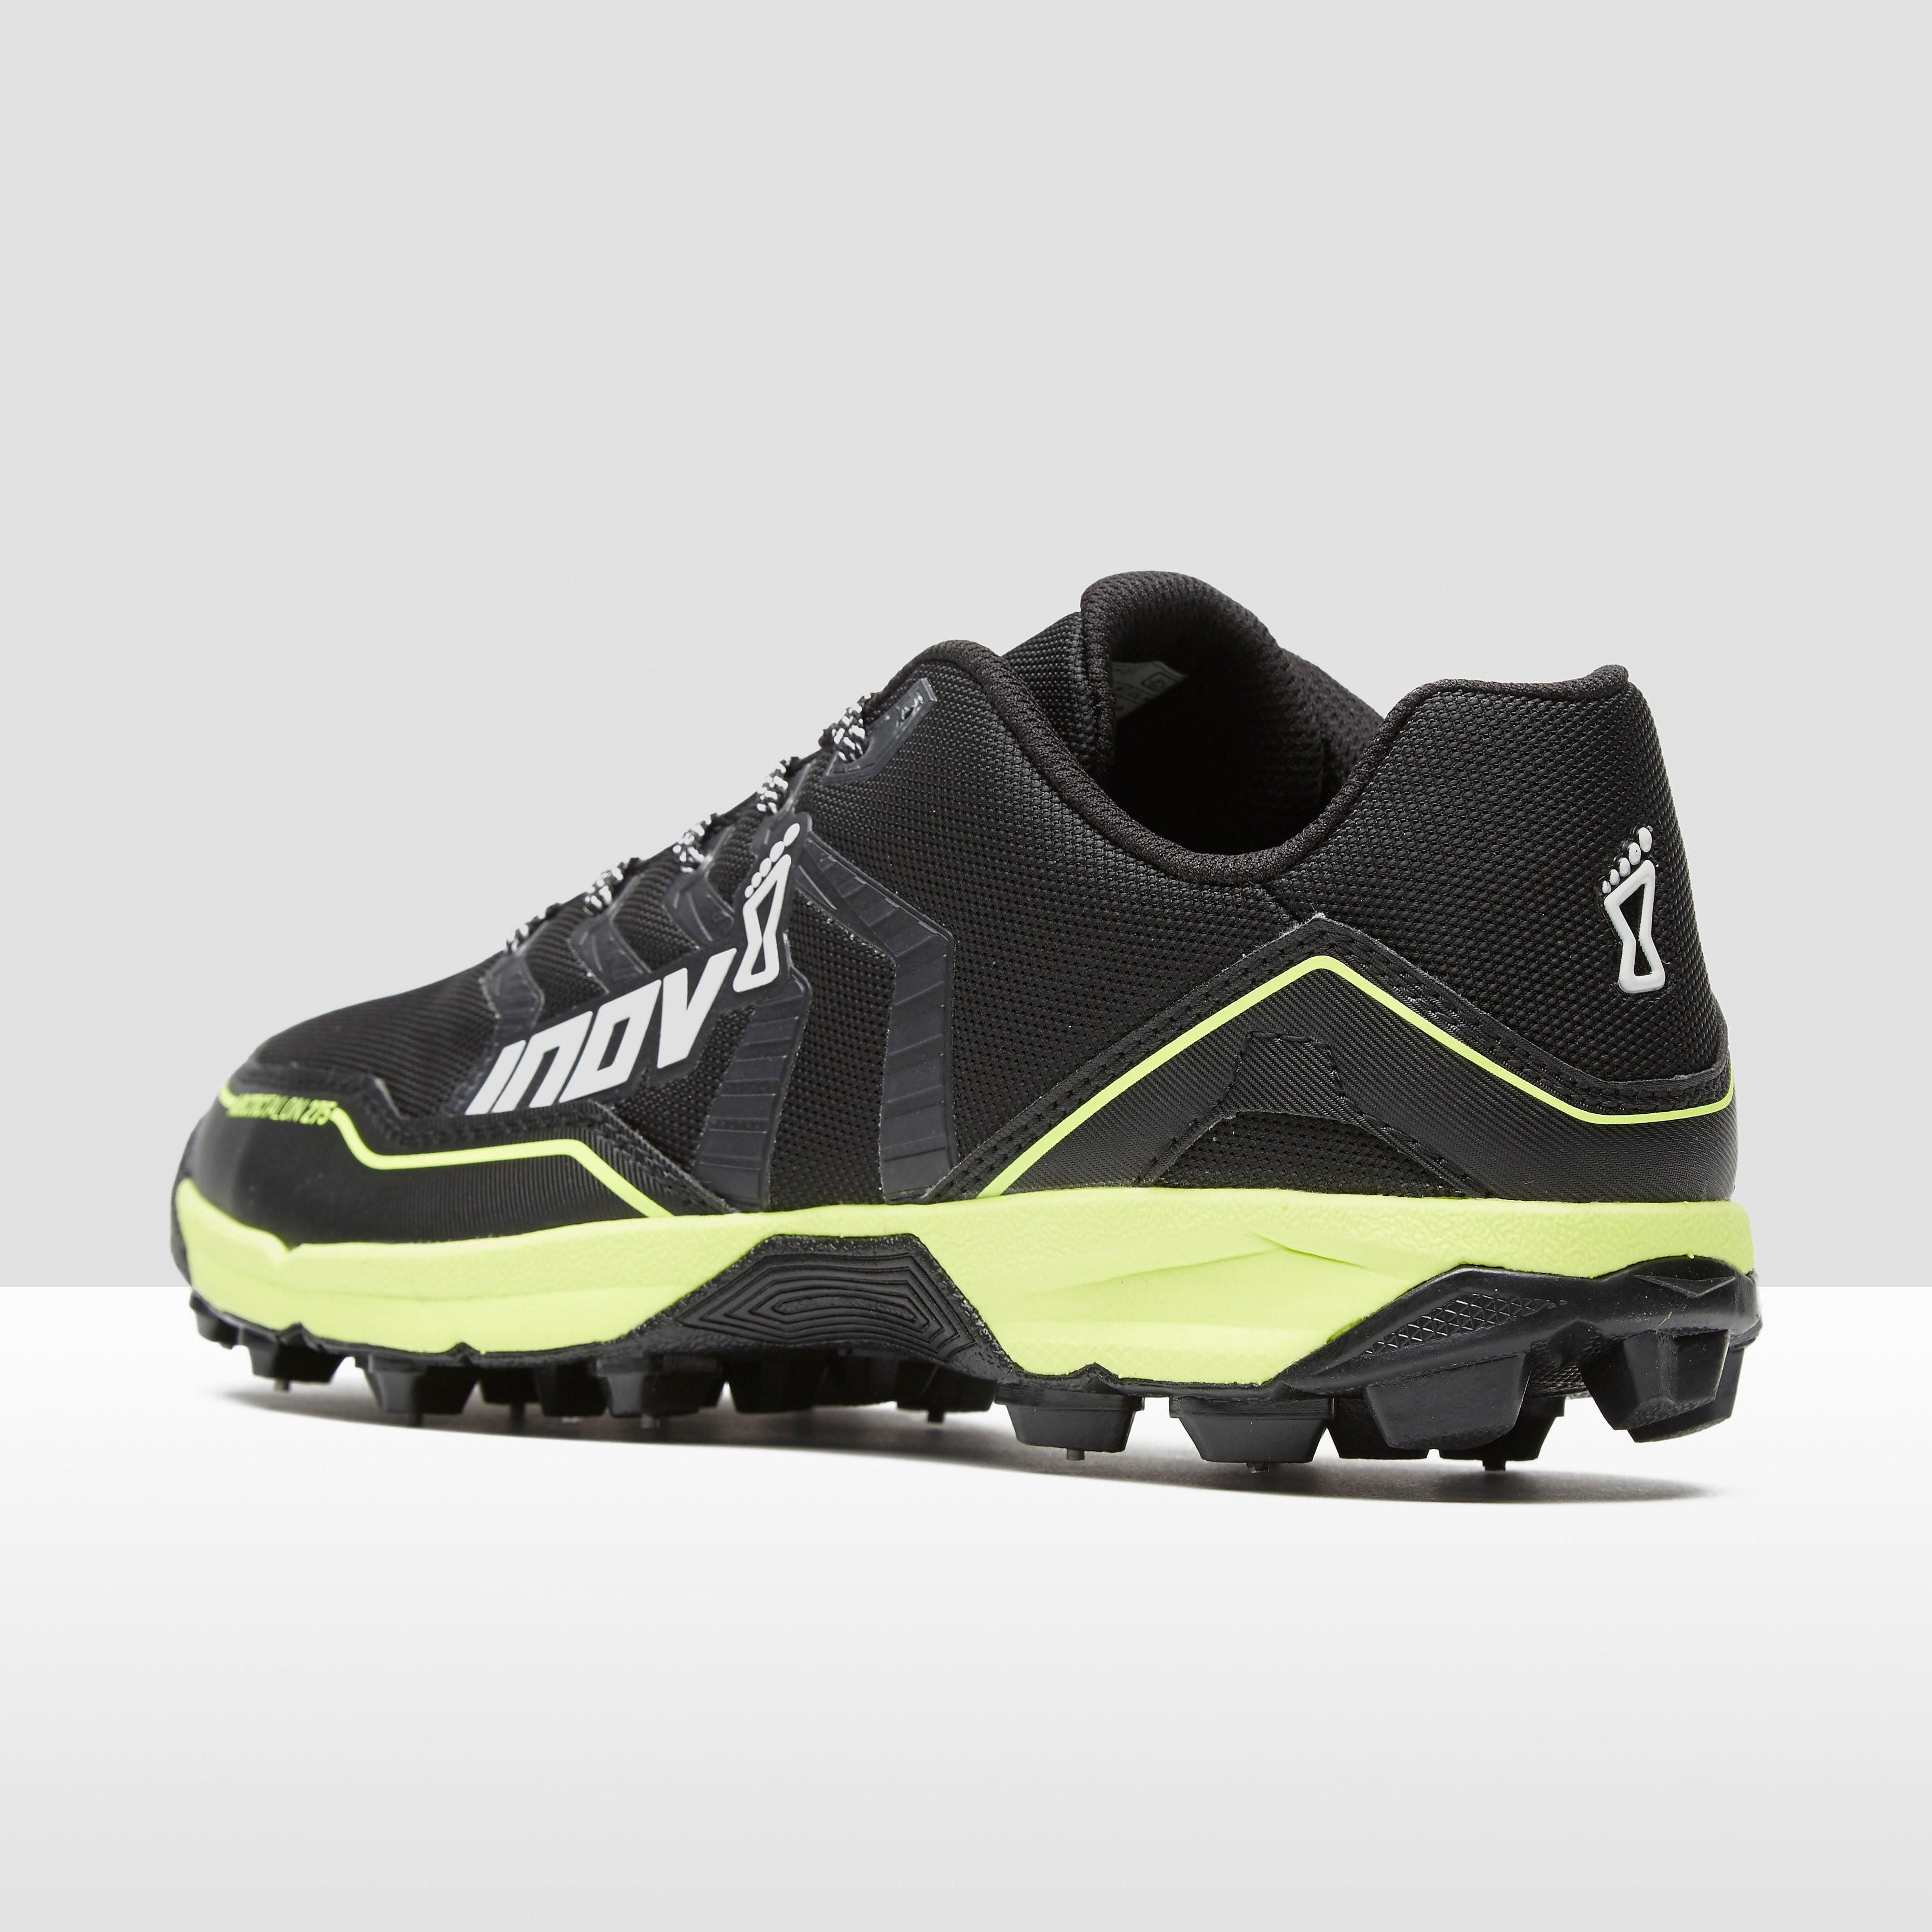 Inov-8 Arctictalon 275 Men's Trail Running Shoes